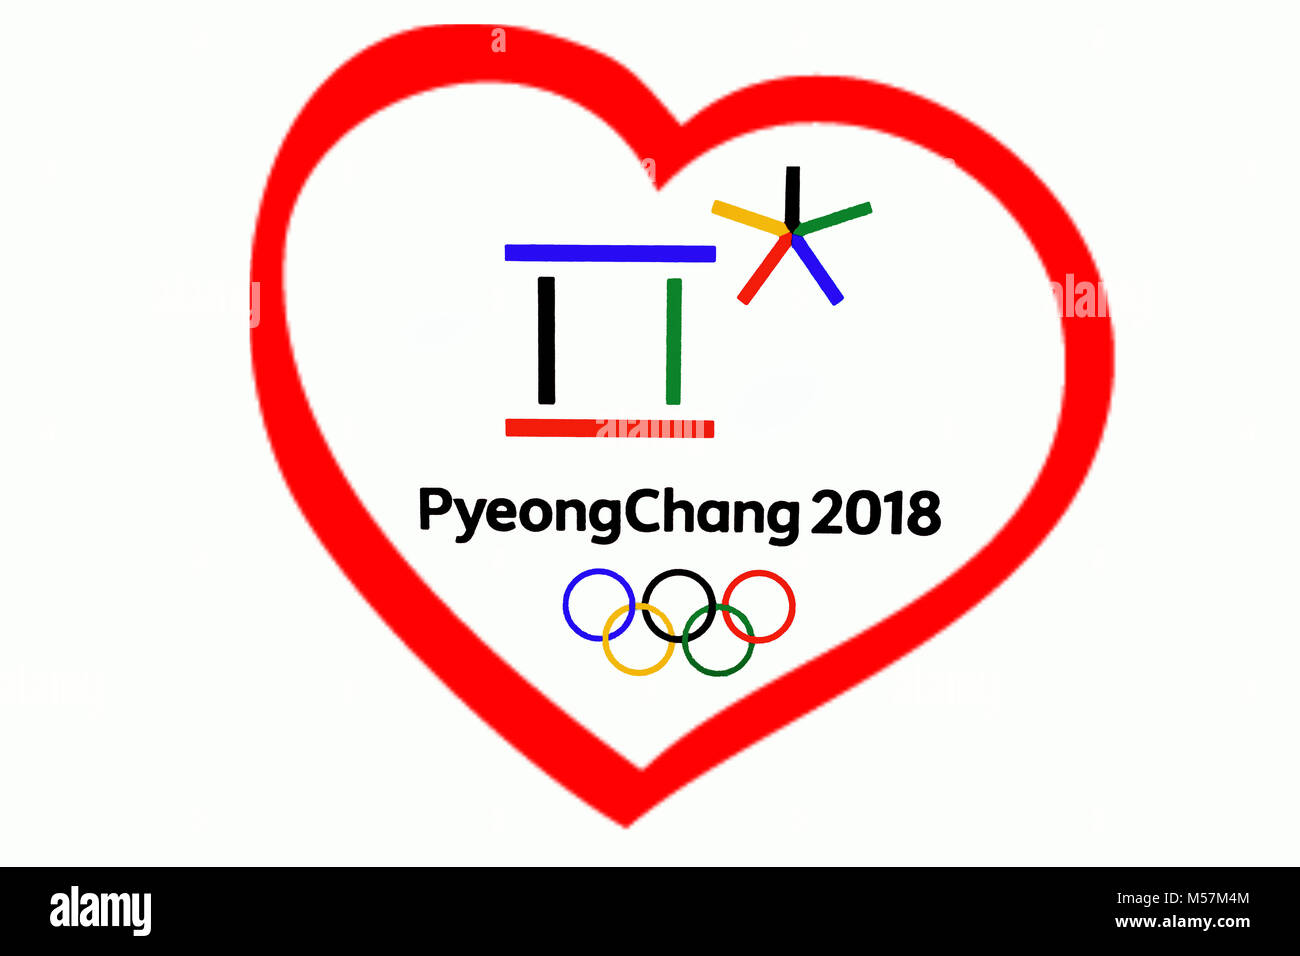 Xxiii olympic winter games stock photos xxiii olympic winter 14 december 2017 moscow russia symbols xxiii winter olympic games in pyeongchang republic of buycottarizona